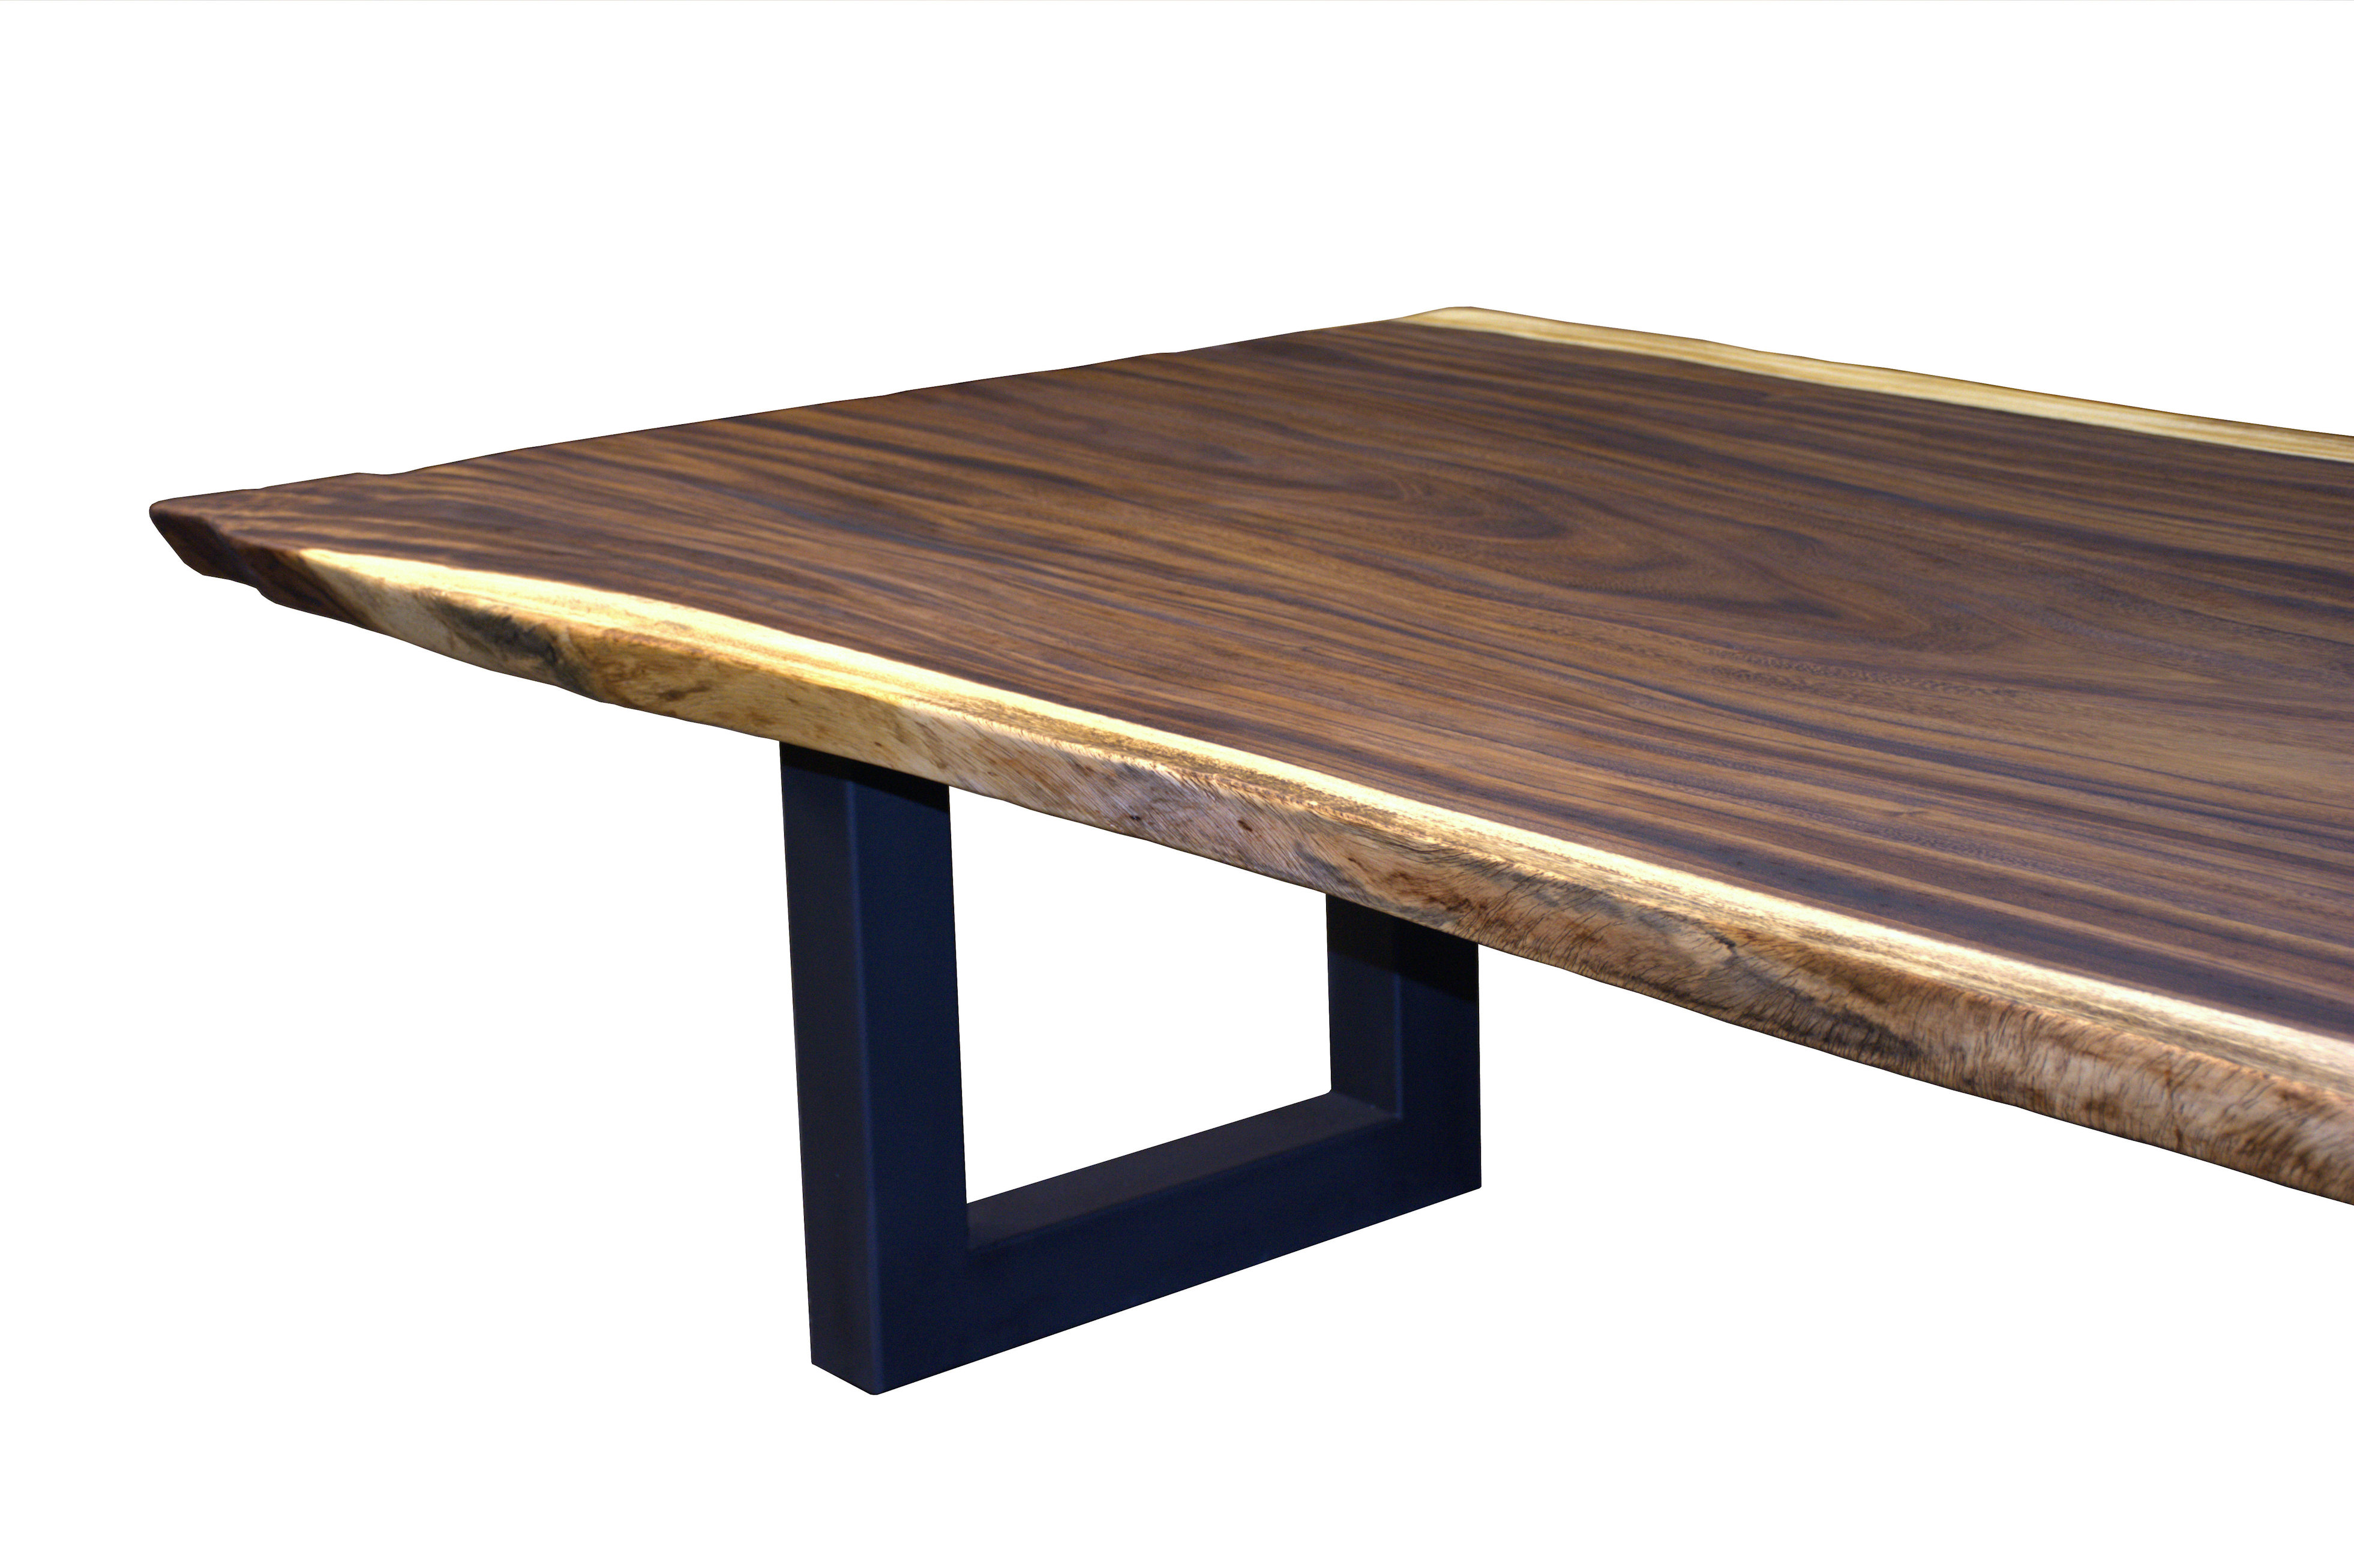 Guanacaste Parota Live Edge Wood Slab Countertop Photo Gallery